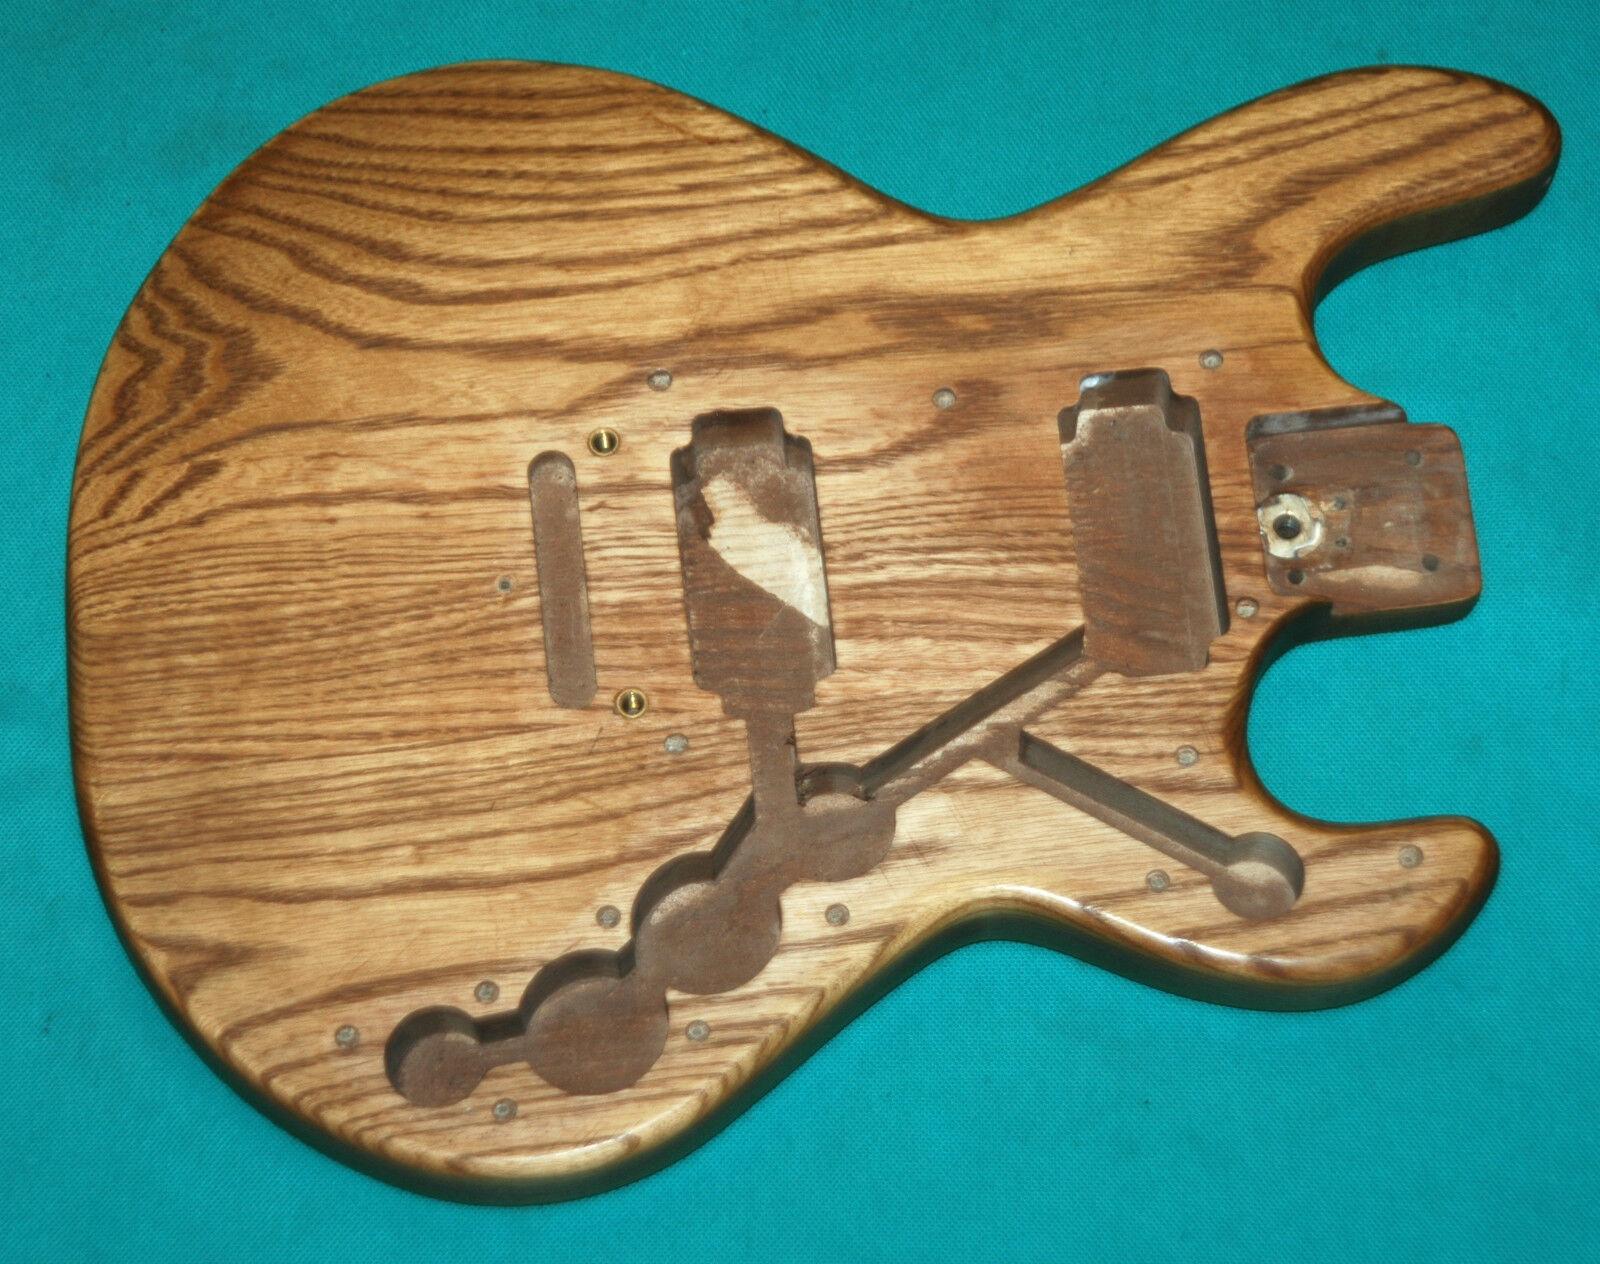 Vtg 1983 Peavey T-15 Electric Guitar Original Guitar Body Made in USA